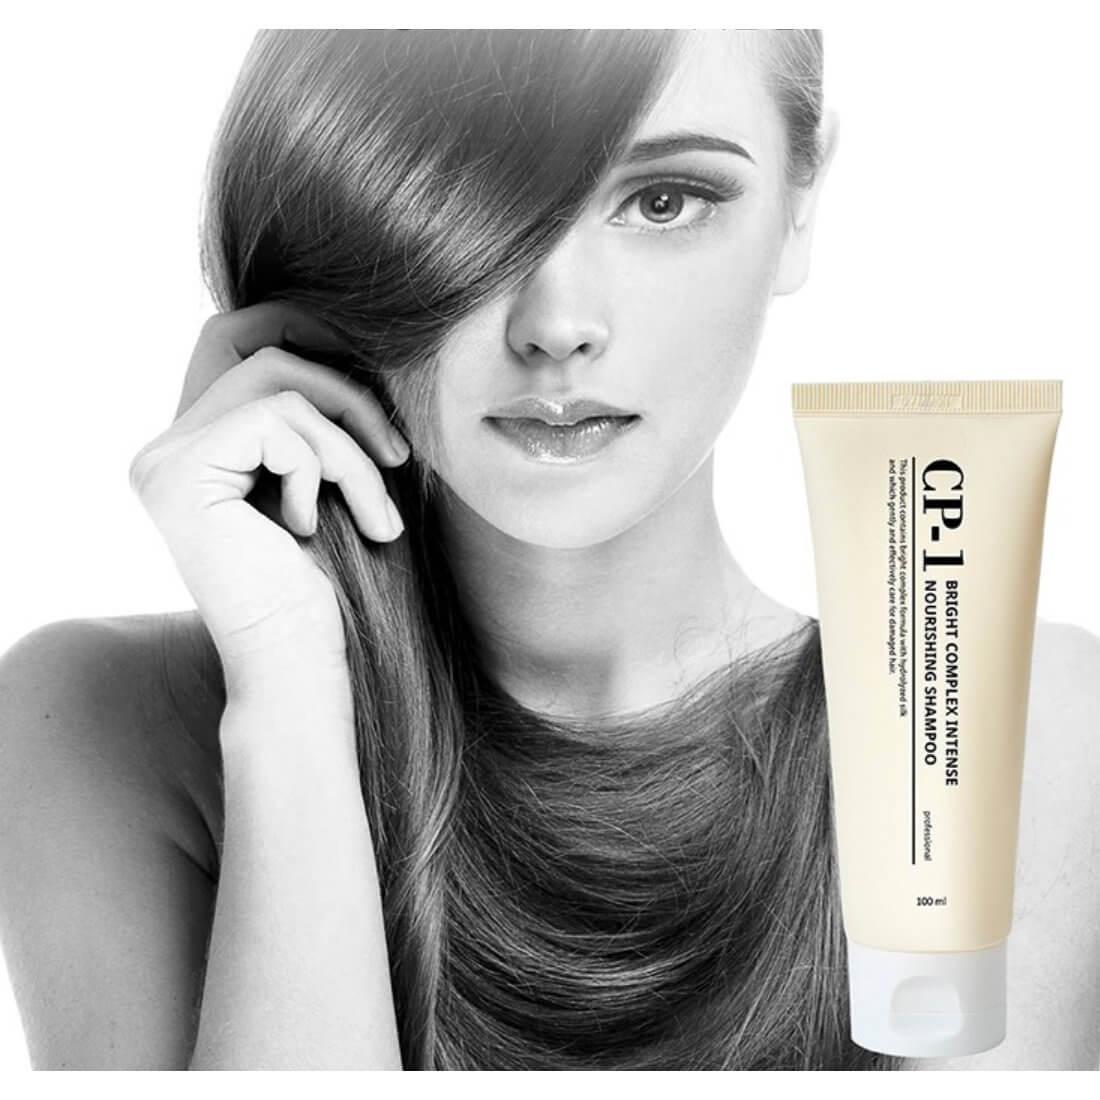 Питающий шампунь для волос CP-1 Bright Complex Intense Nourishing Shampoo 100 мл